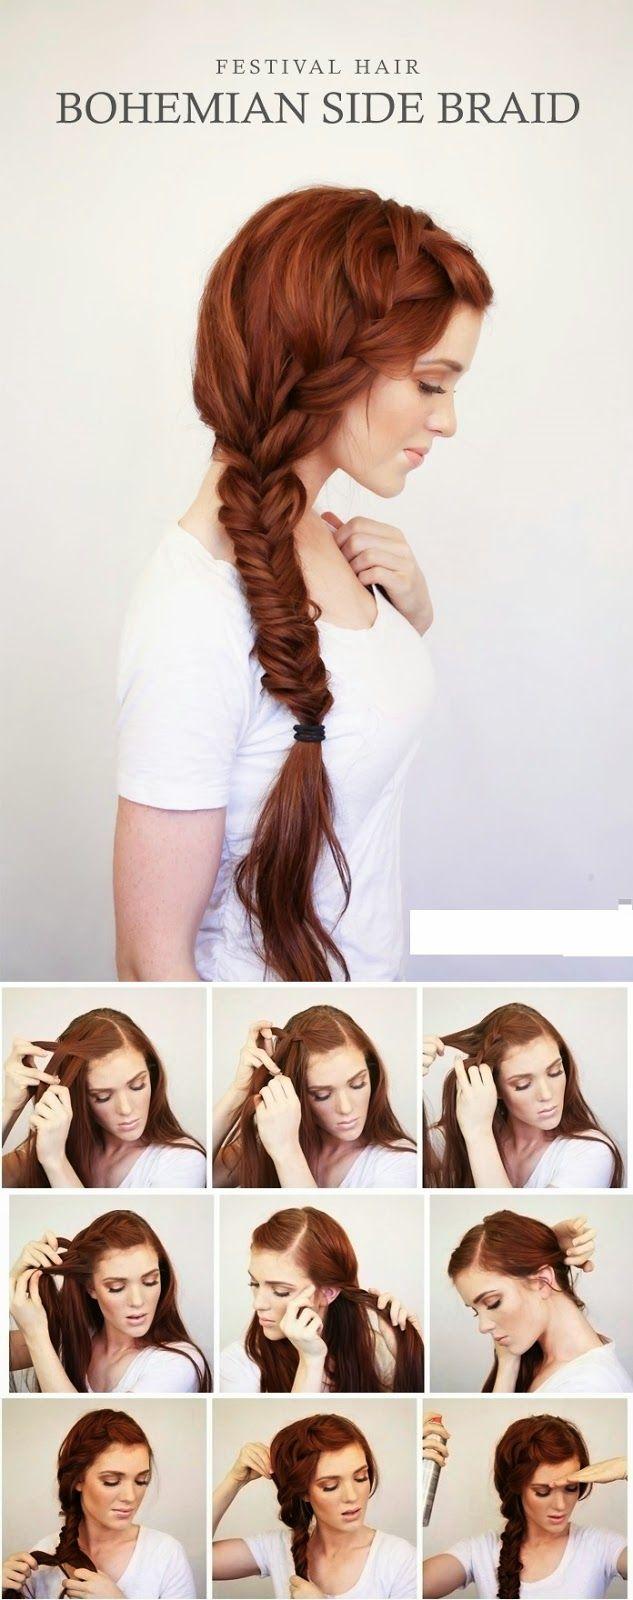 Astounding 1000 Ideas About Side Braid Tutorial On Pinterest Side Braids Short Hairstyles For Black Women Fulllsitofus